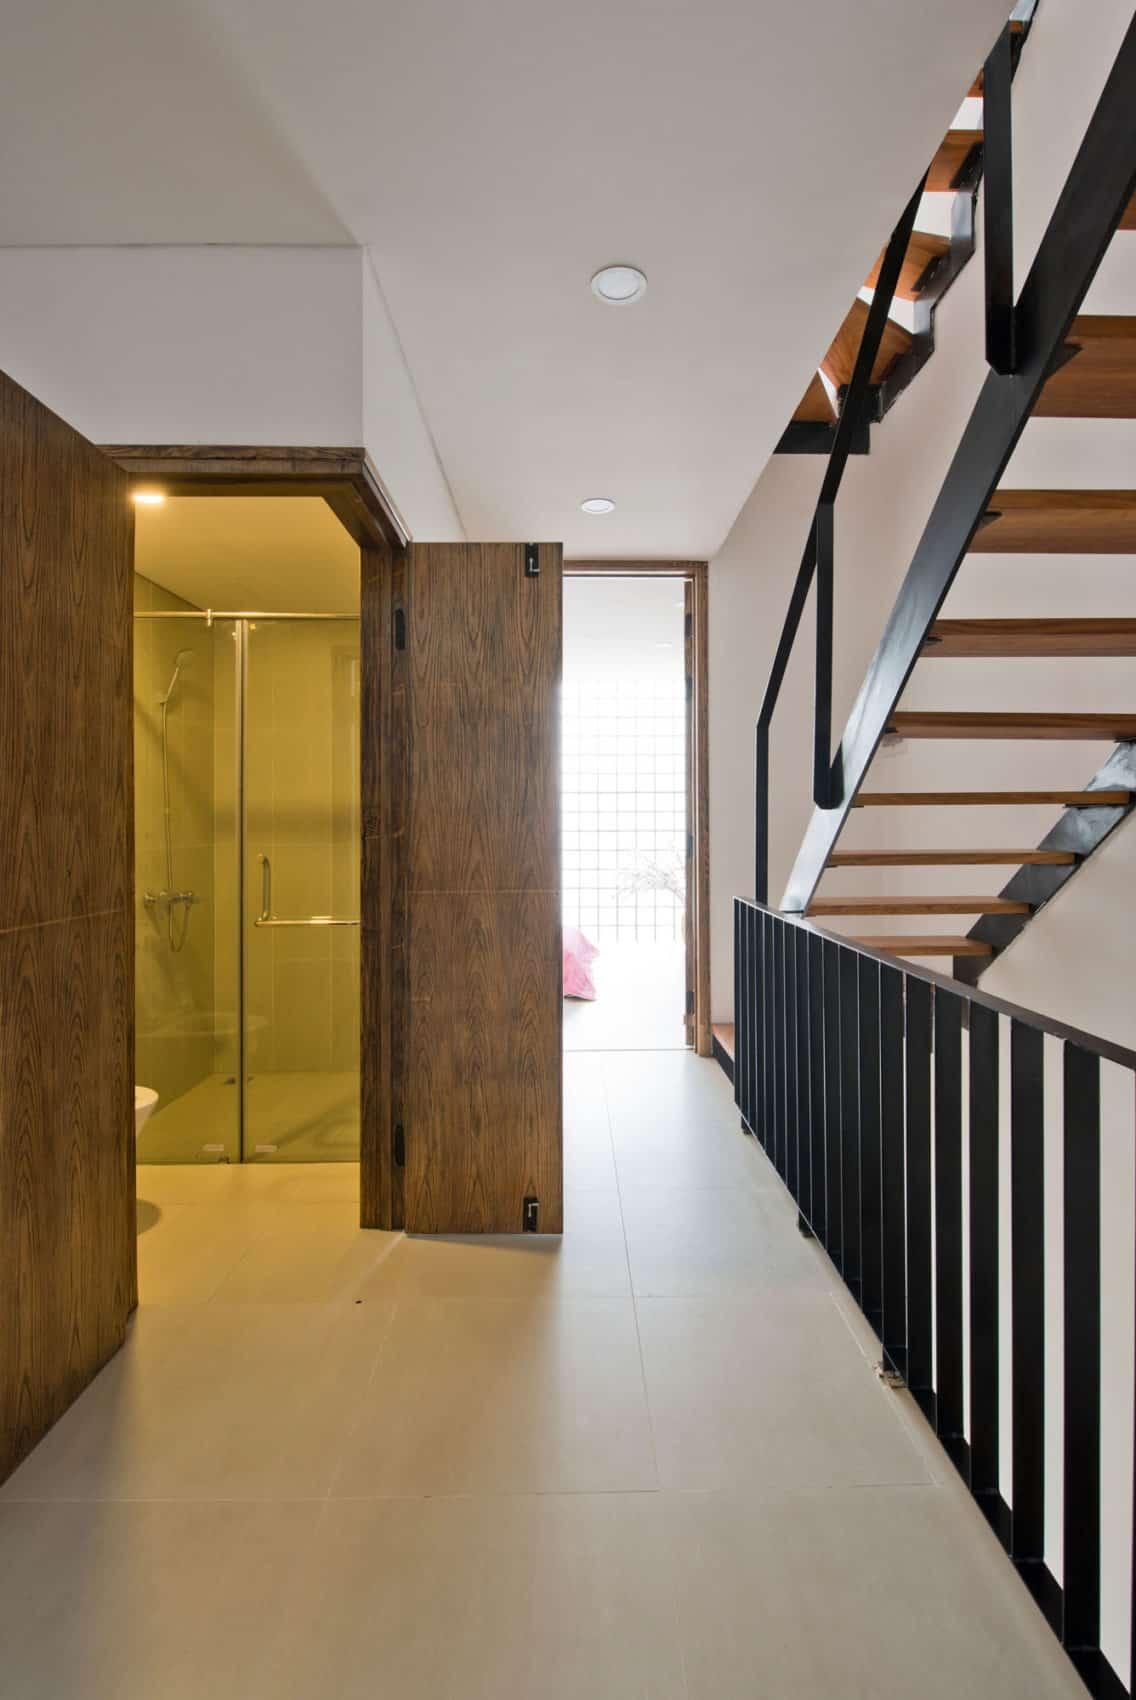 Narrow TT House in Hanoi by Adrei Studio Architecture (20)